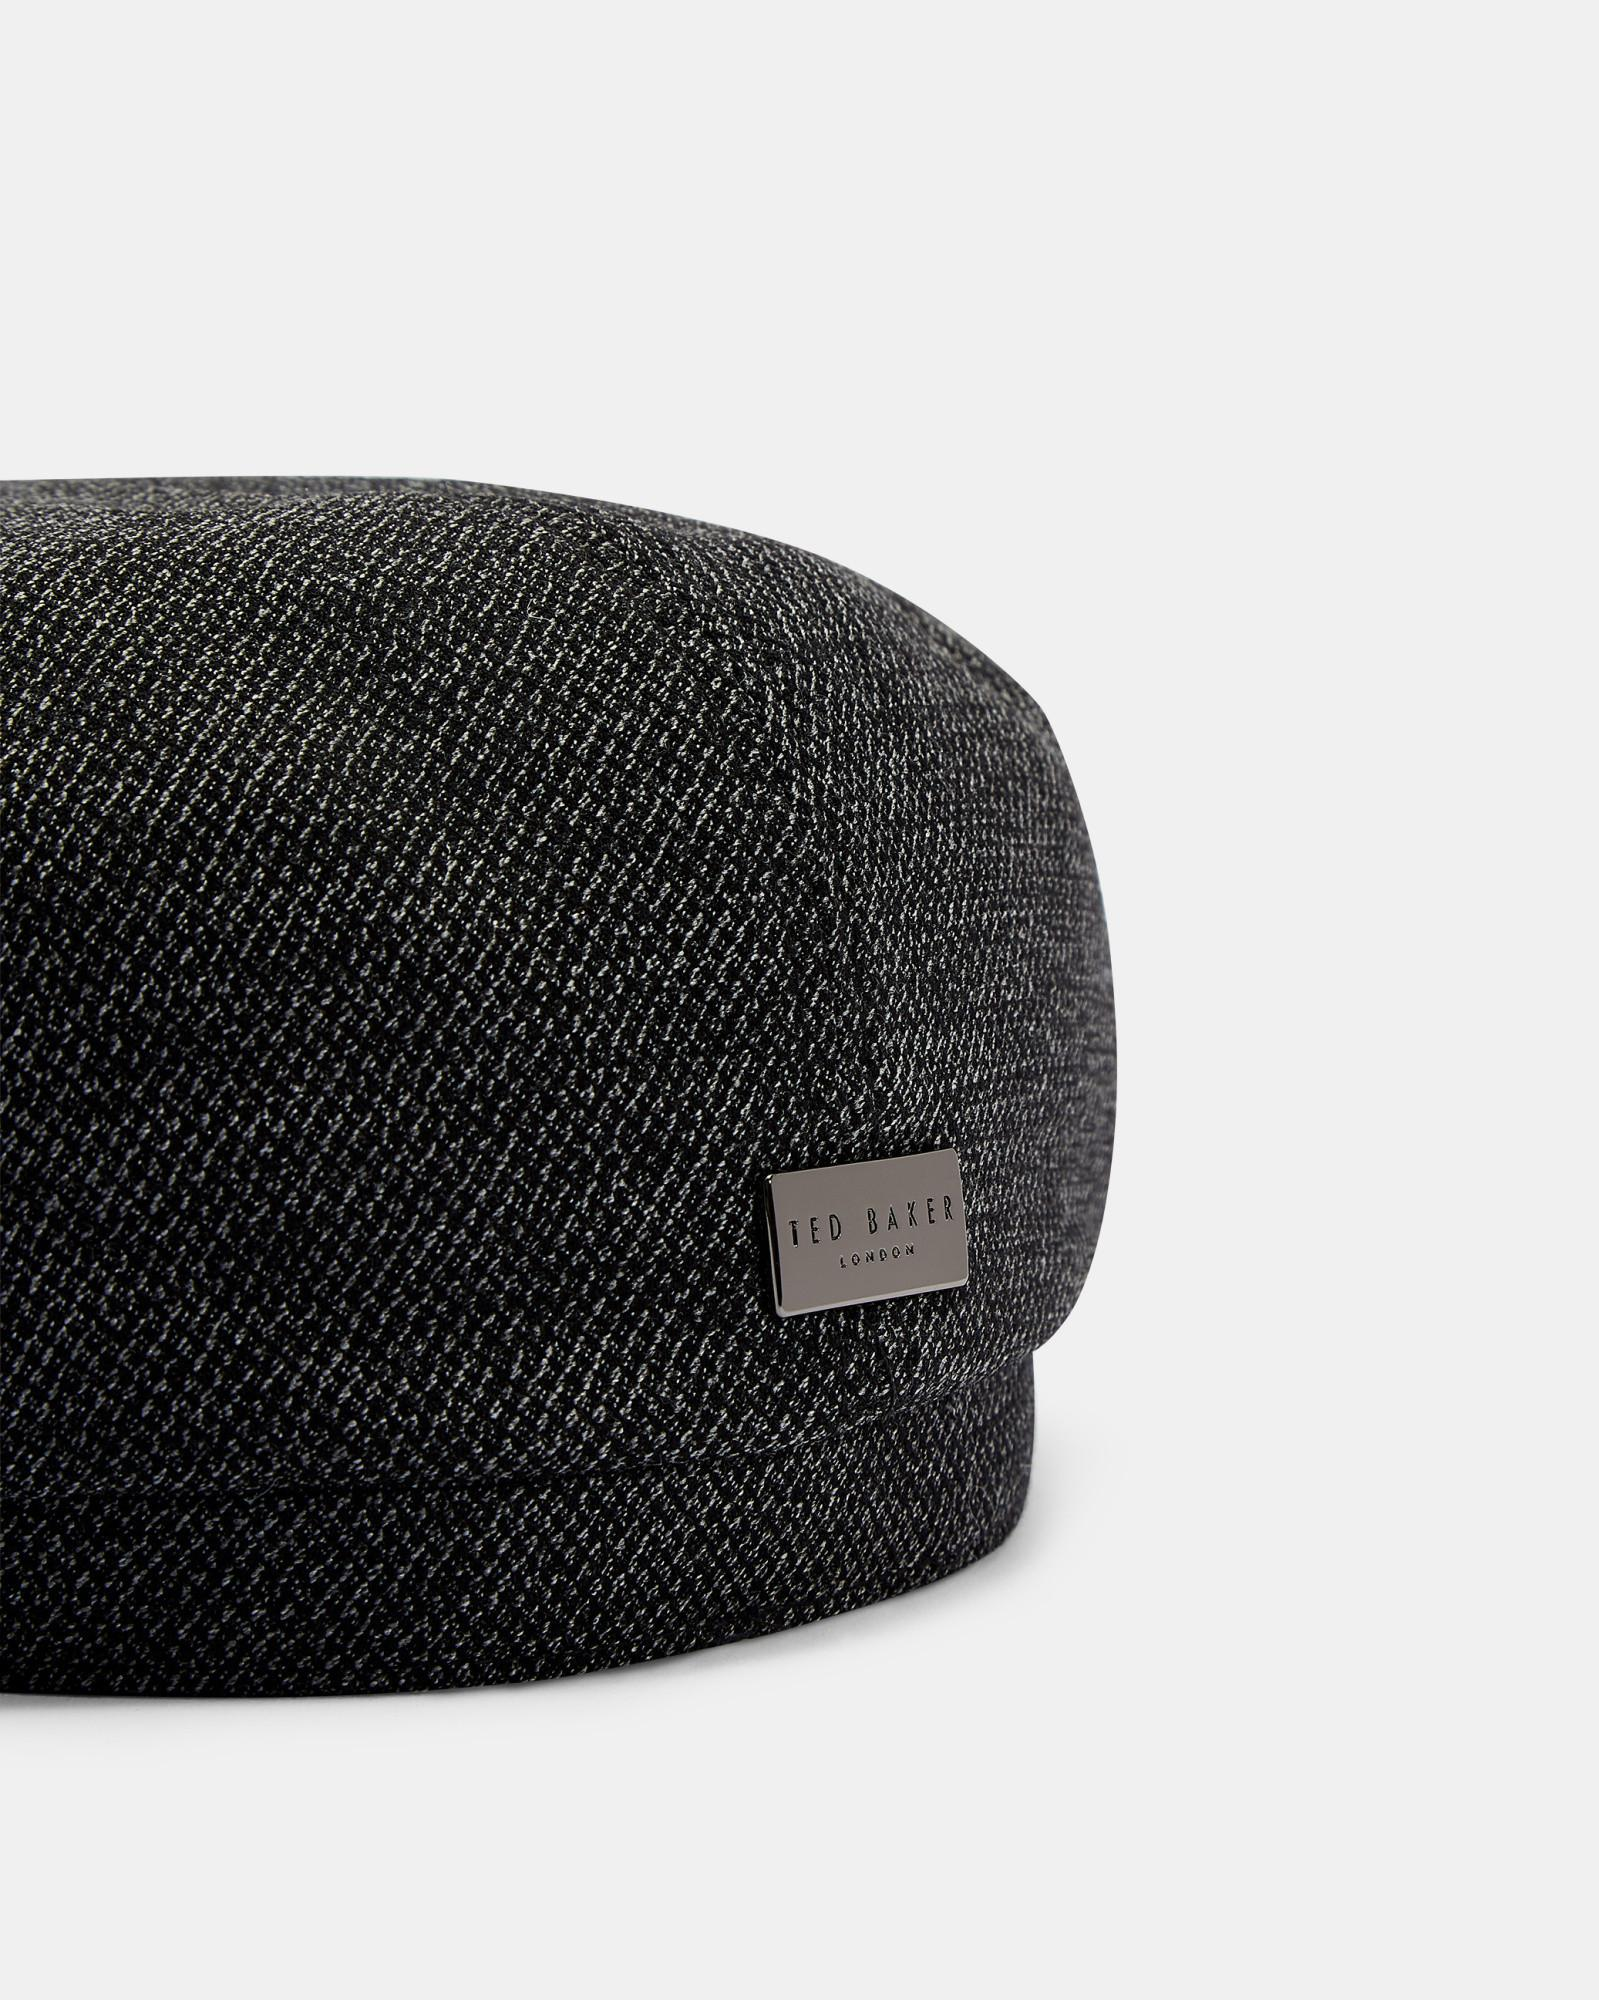 6fd971634 Ted Baker Textured Baker Boy Hat in Gray for Men - Lyst